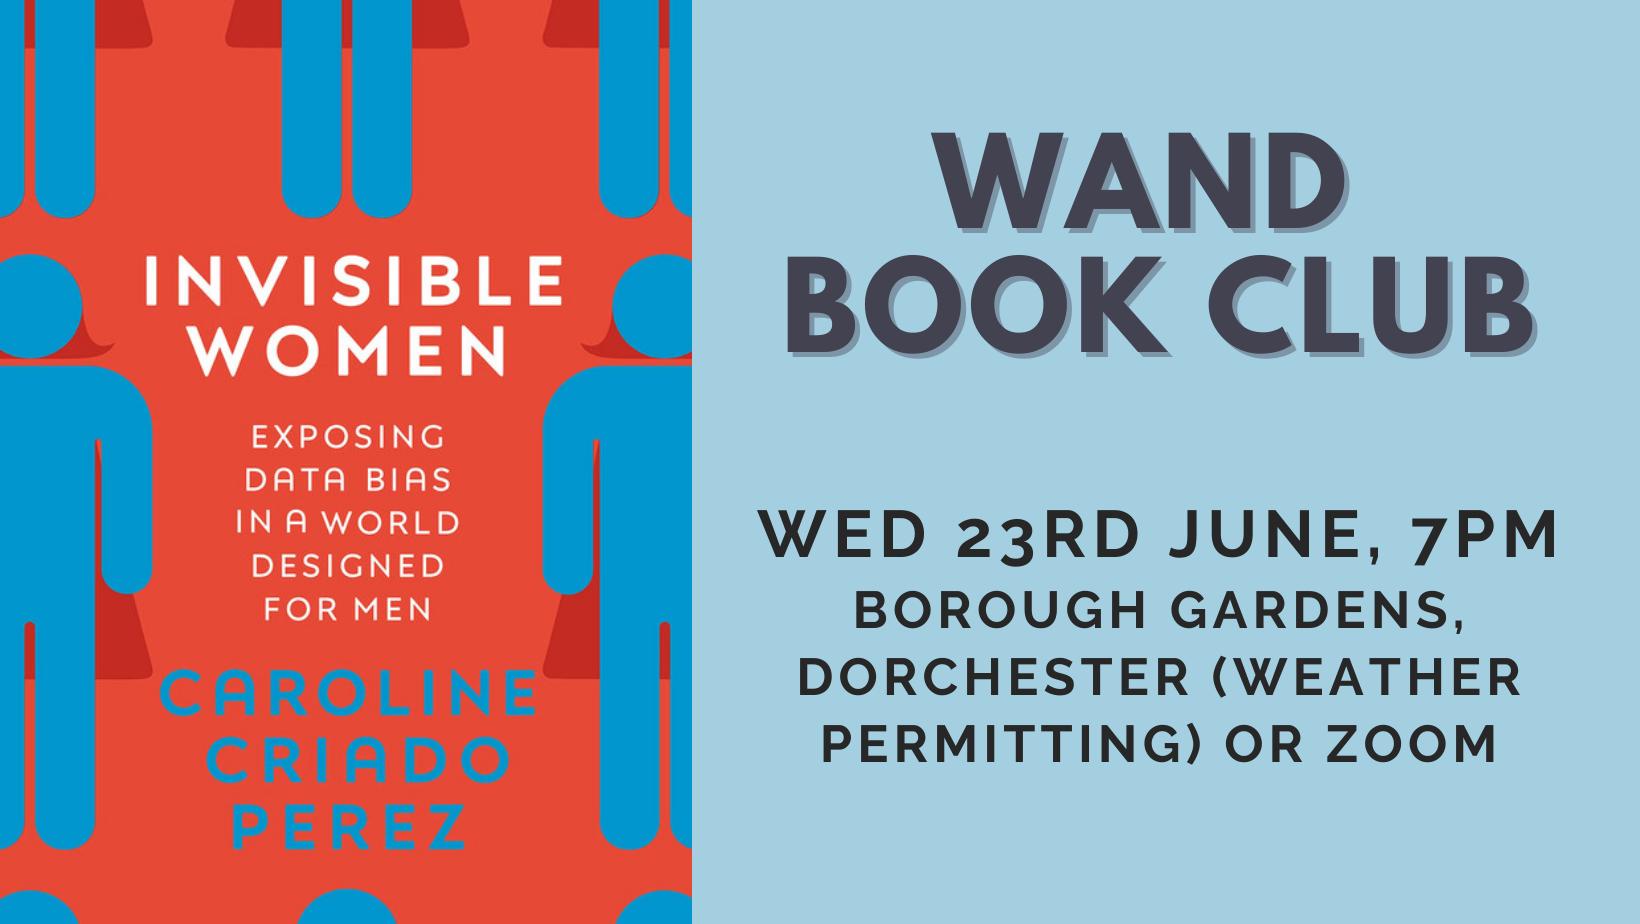 WAND Book Club #3: Invisible Women - Caroline Criado Perez